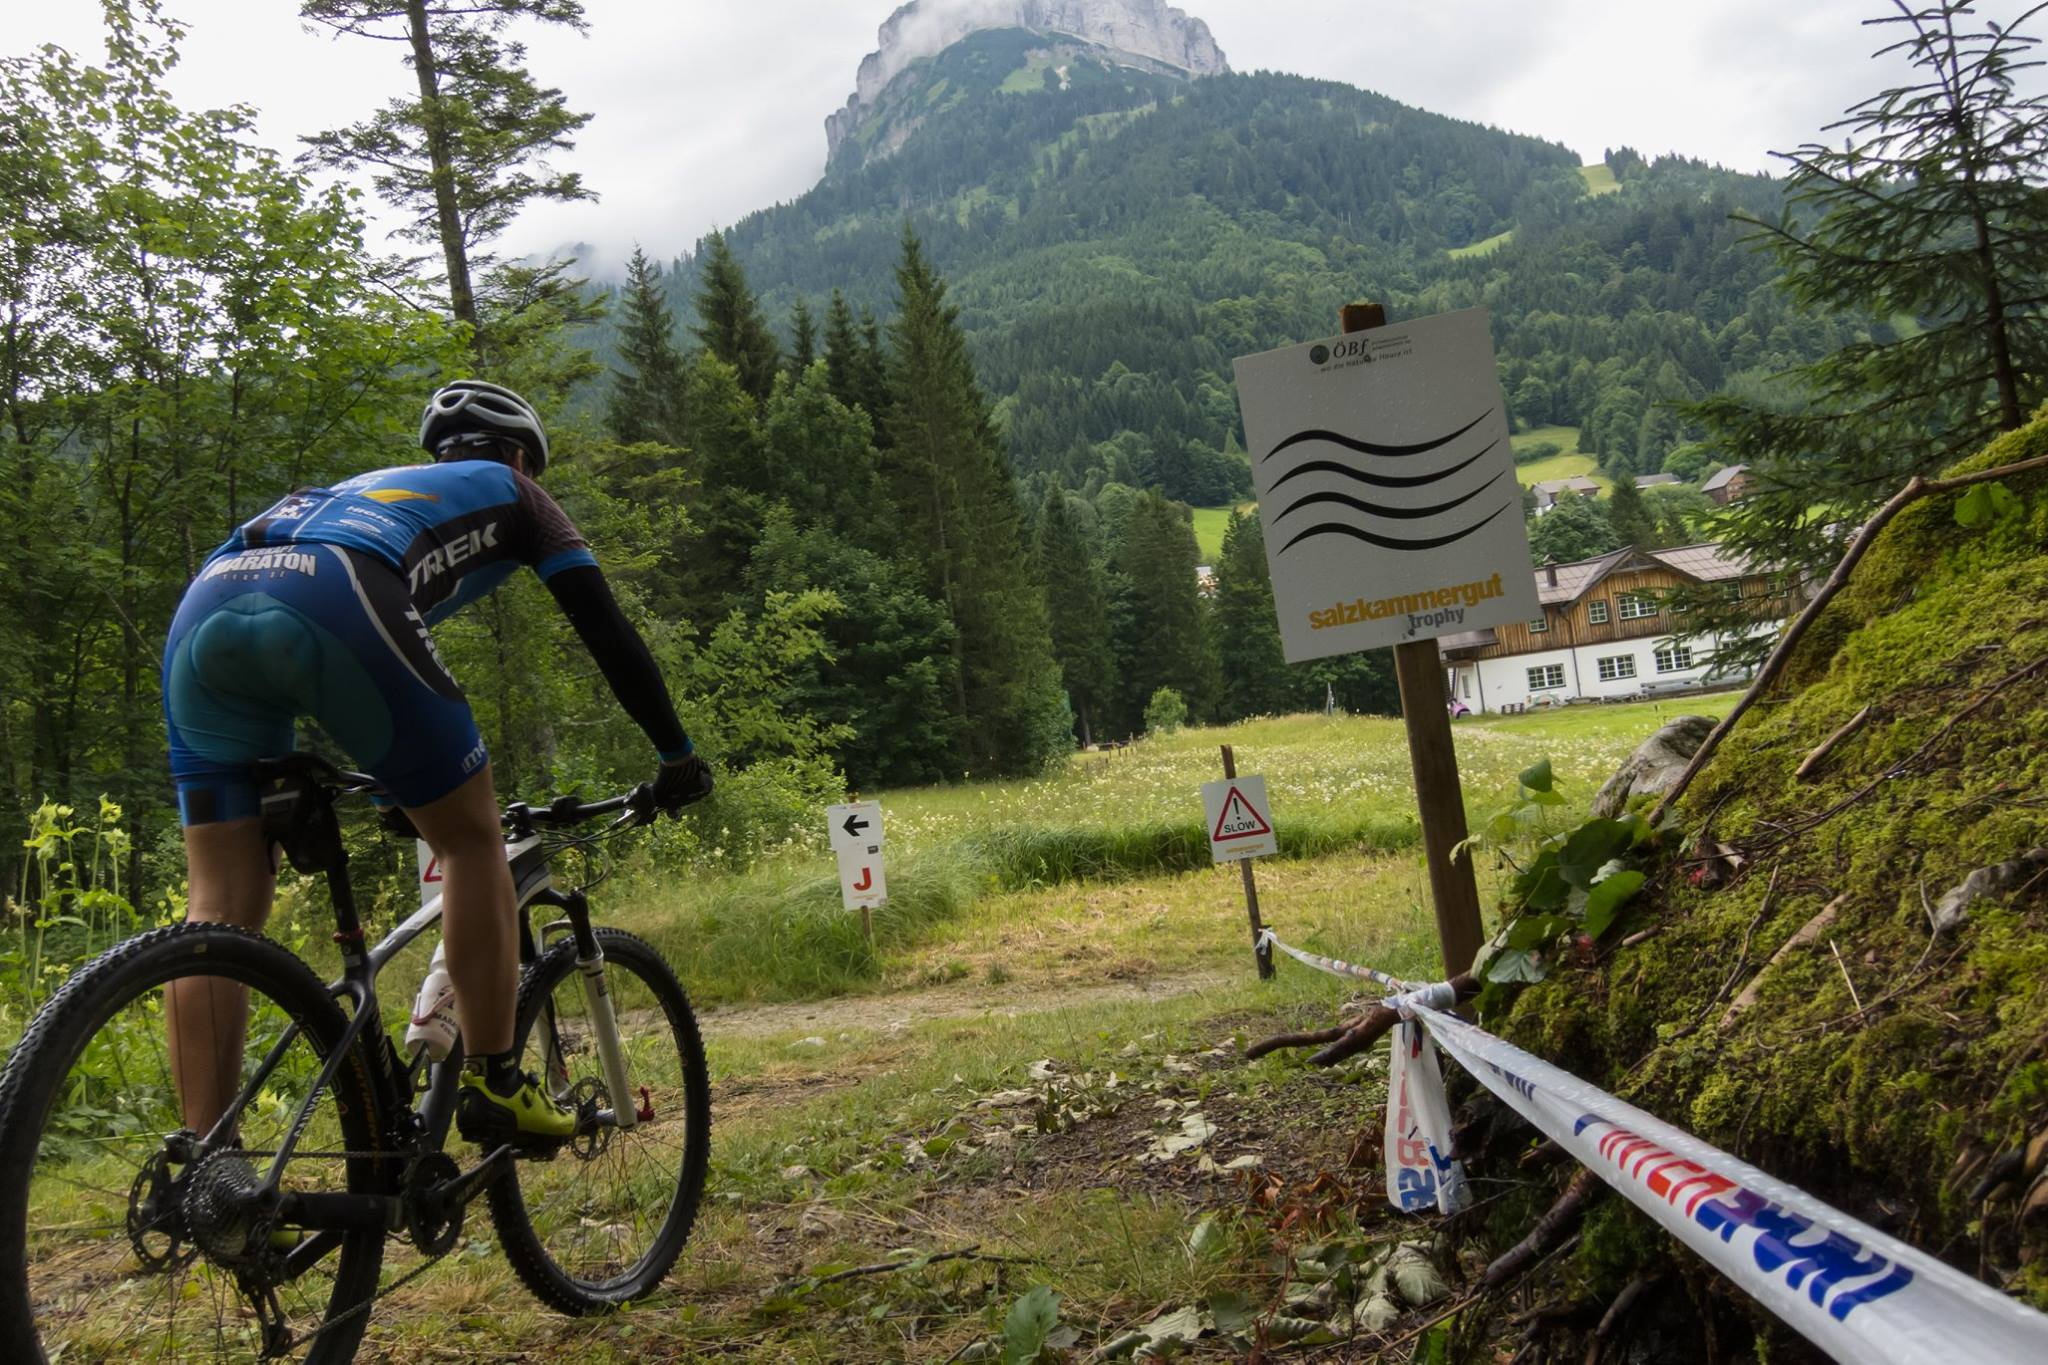 salzkammergut-trophy-mountain-bike-blog-6.jpg